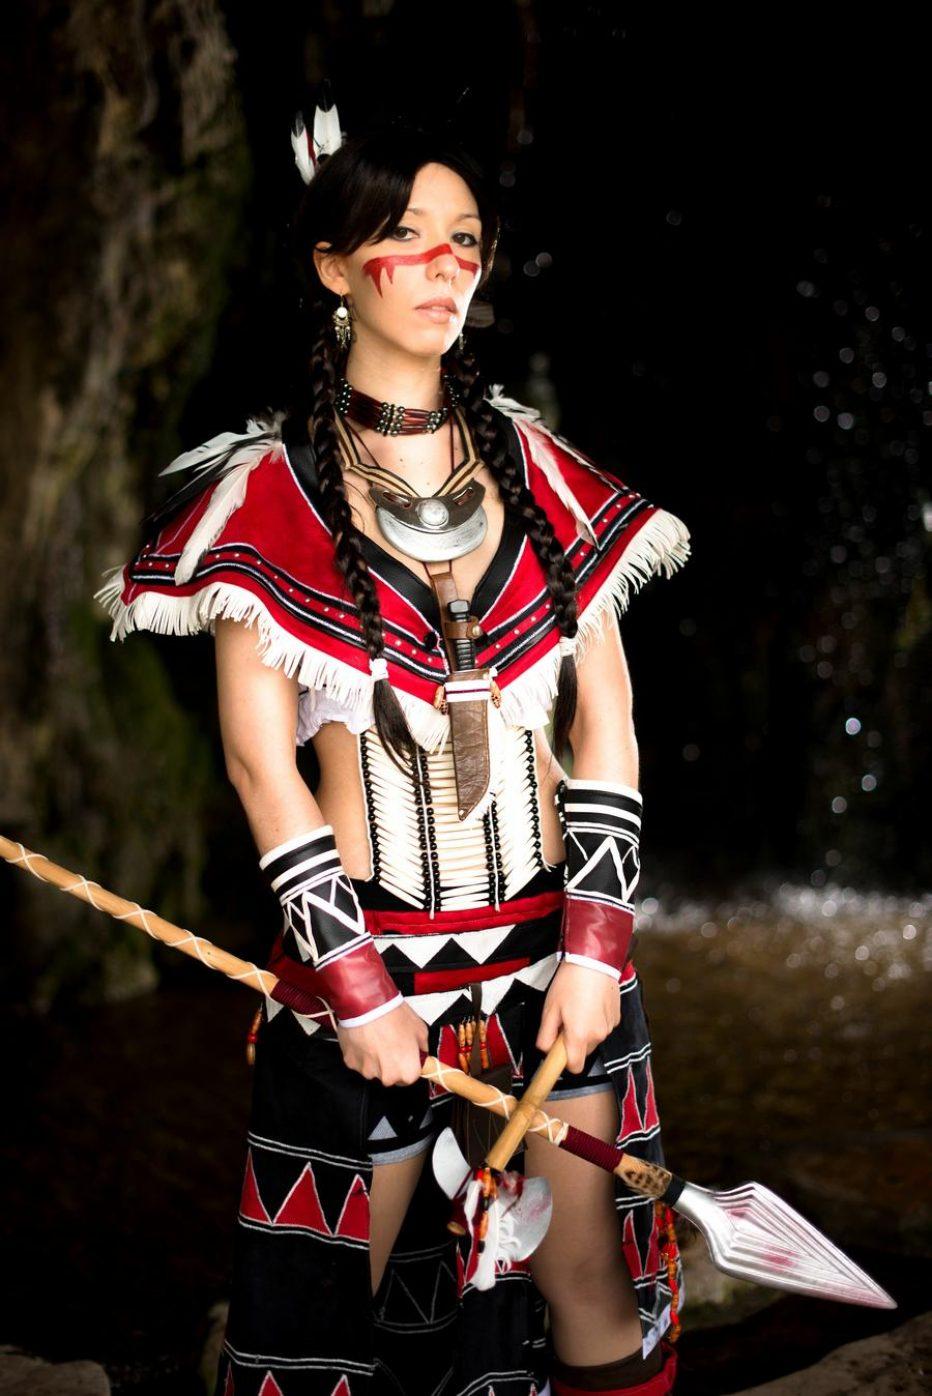 Assassins-Creed-IIIs-Alsoomse-Cosplay-Gamers-Heroes-5.jpg